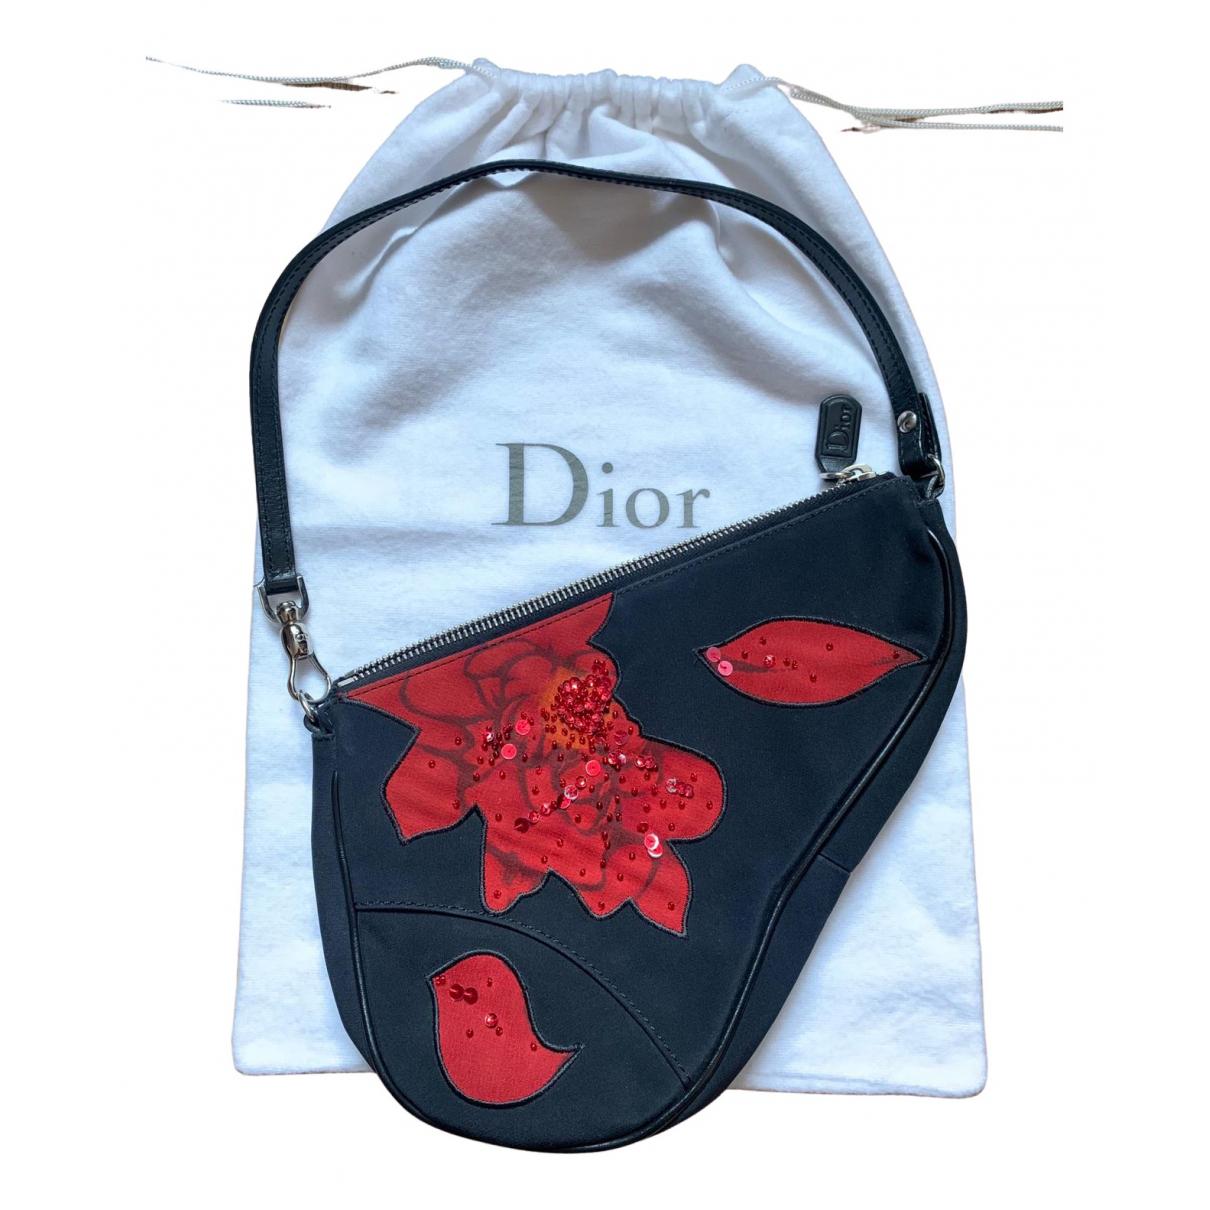 Bolso baguette Saddle de Lona Dior